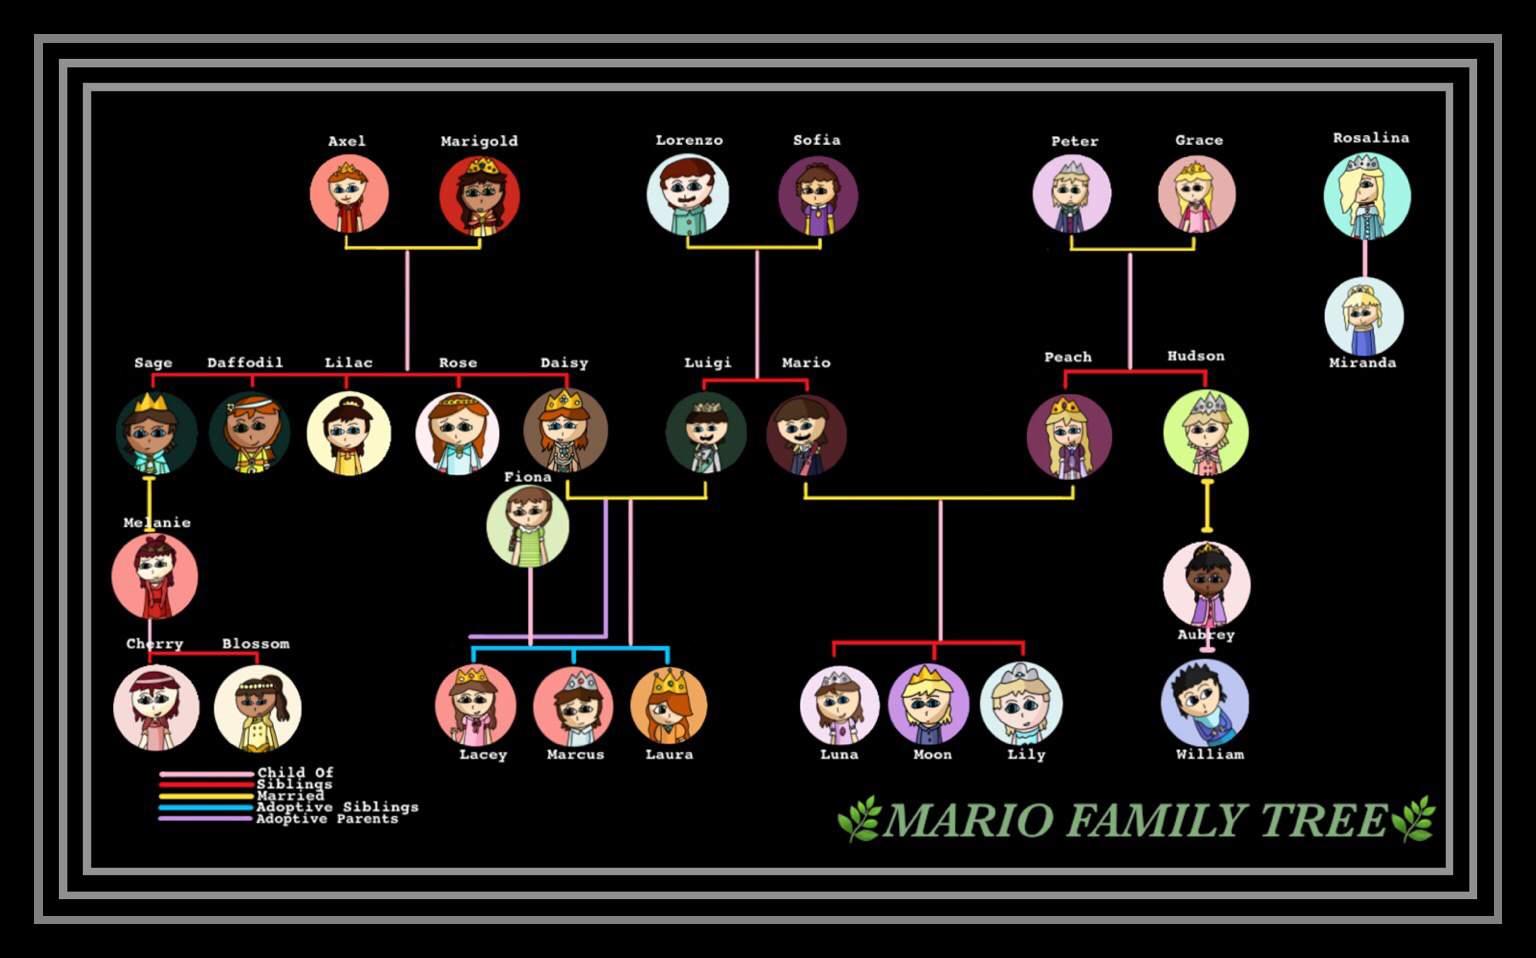 Luigi's mansion portrait ghost family tree |Luigis Family Tree